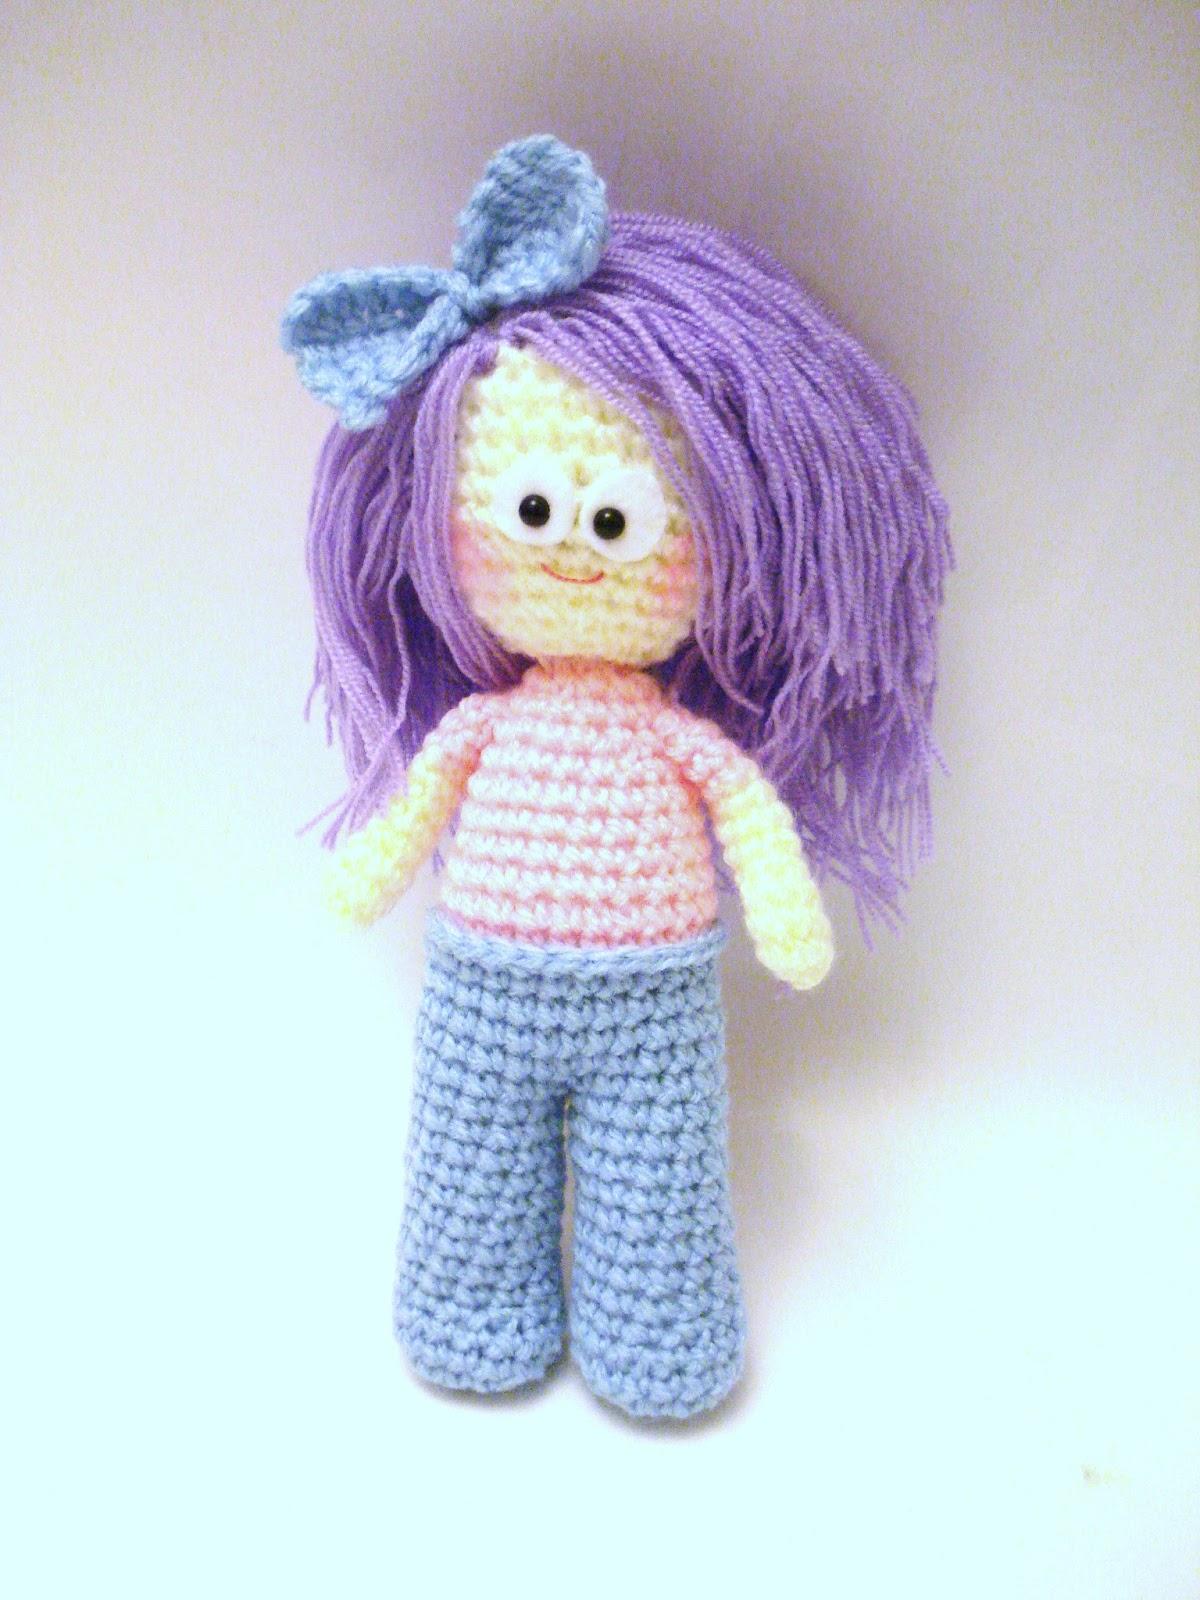 Amigurumi Girl Doll Pattern : AllSoCute Amigurumis: Crochet Girl, Doll Pattern ...